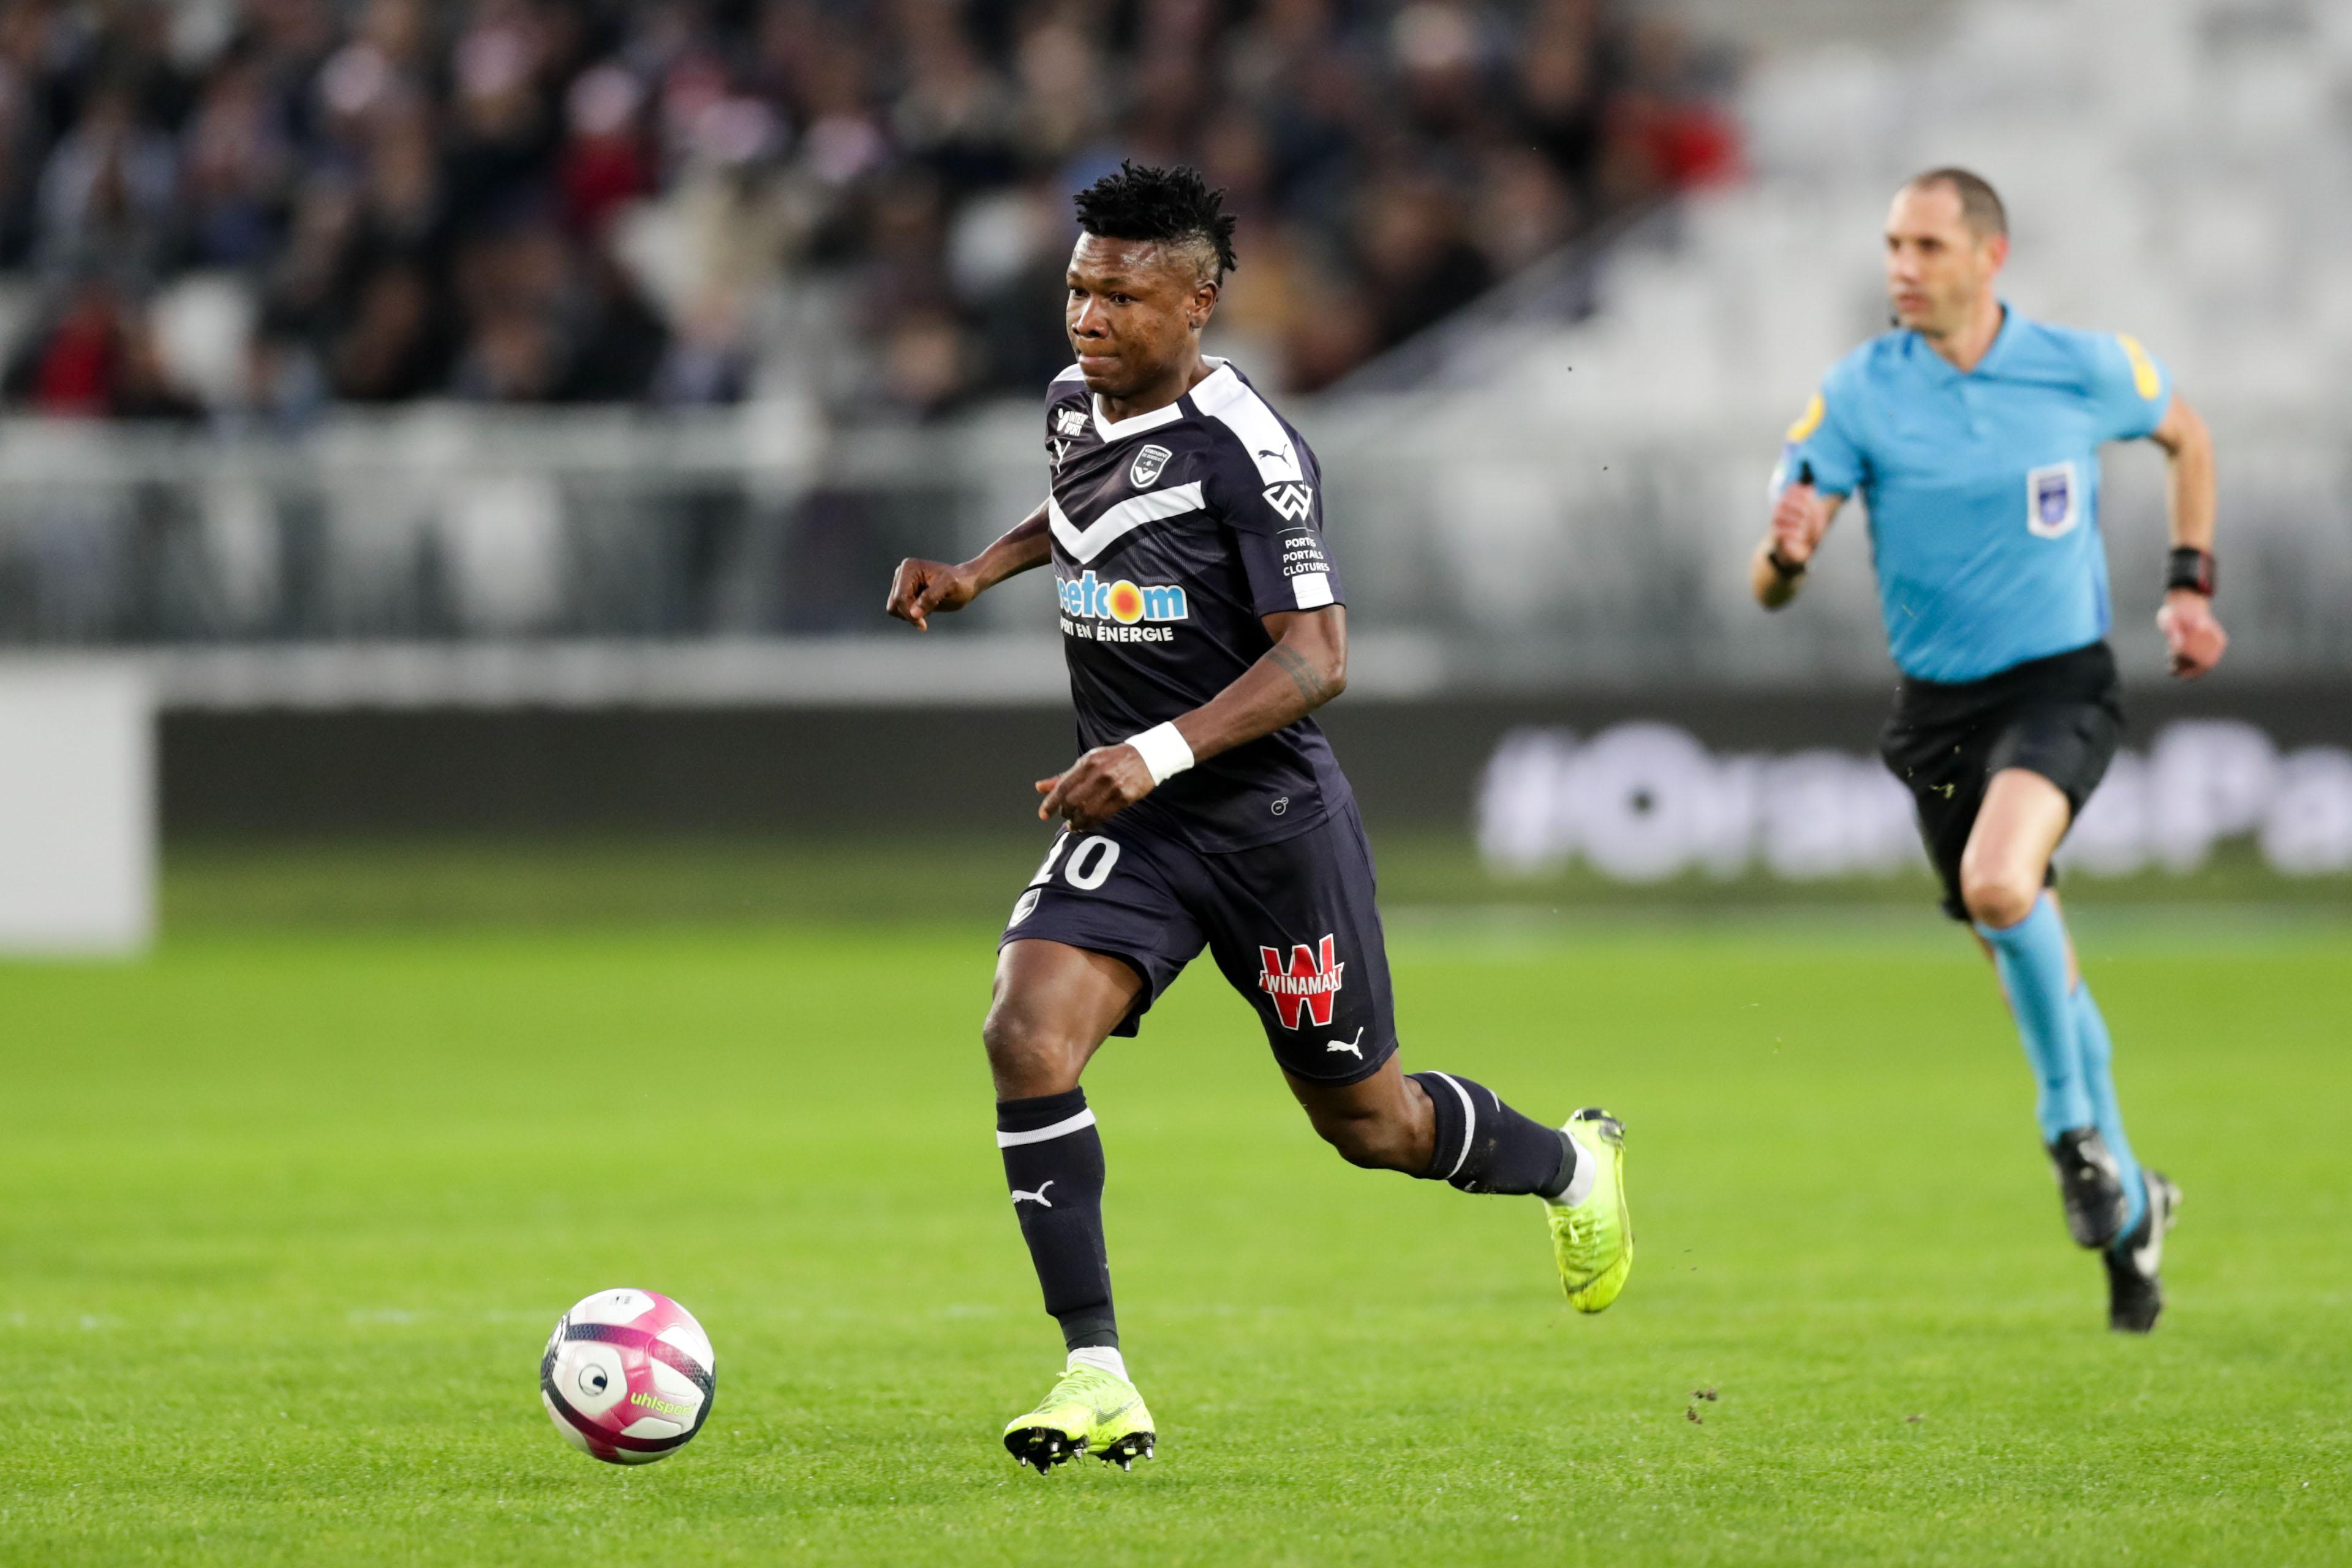 Football - Ligue 1 - Ligue 1 : Bordeaux-Dijon en direct